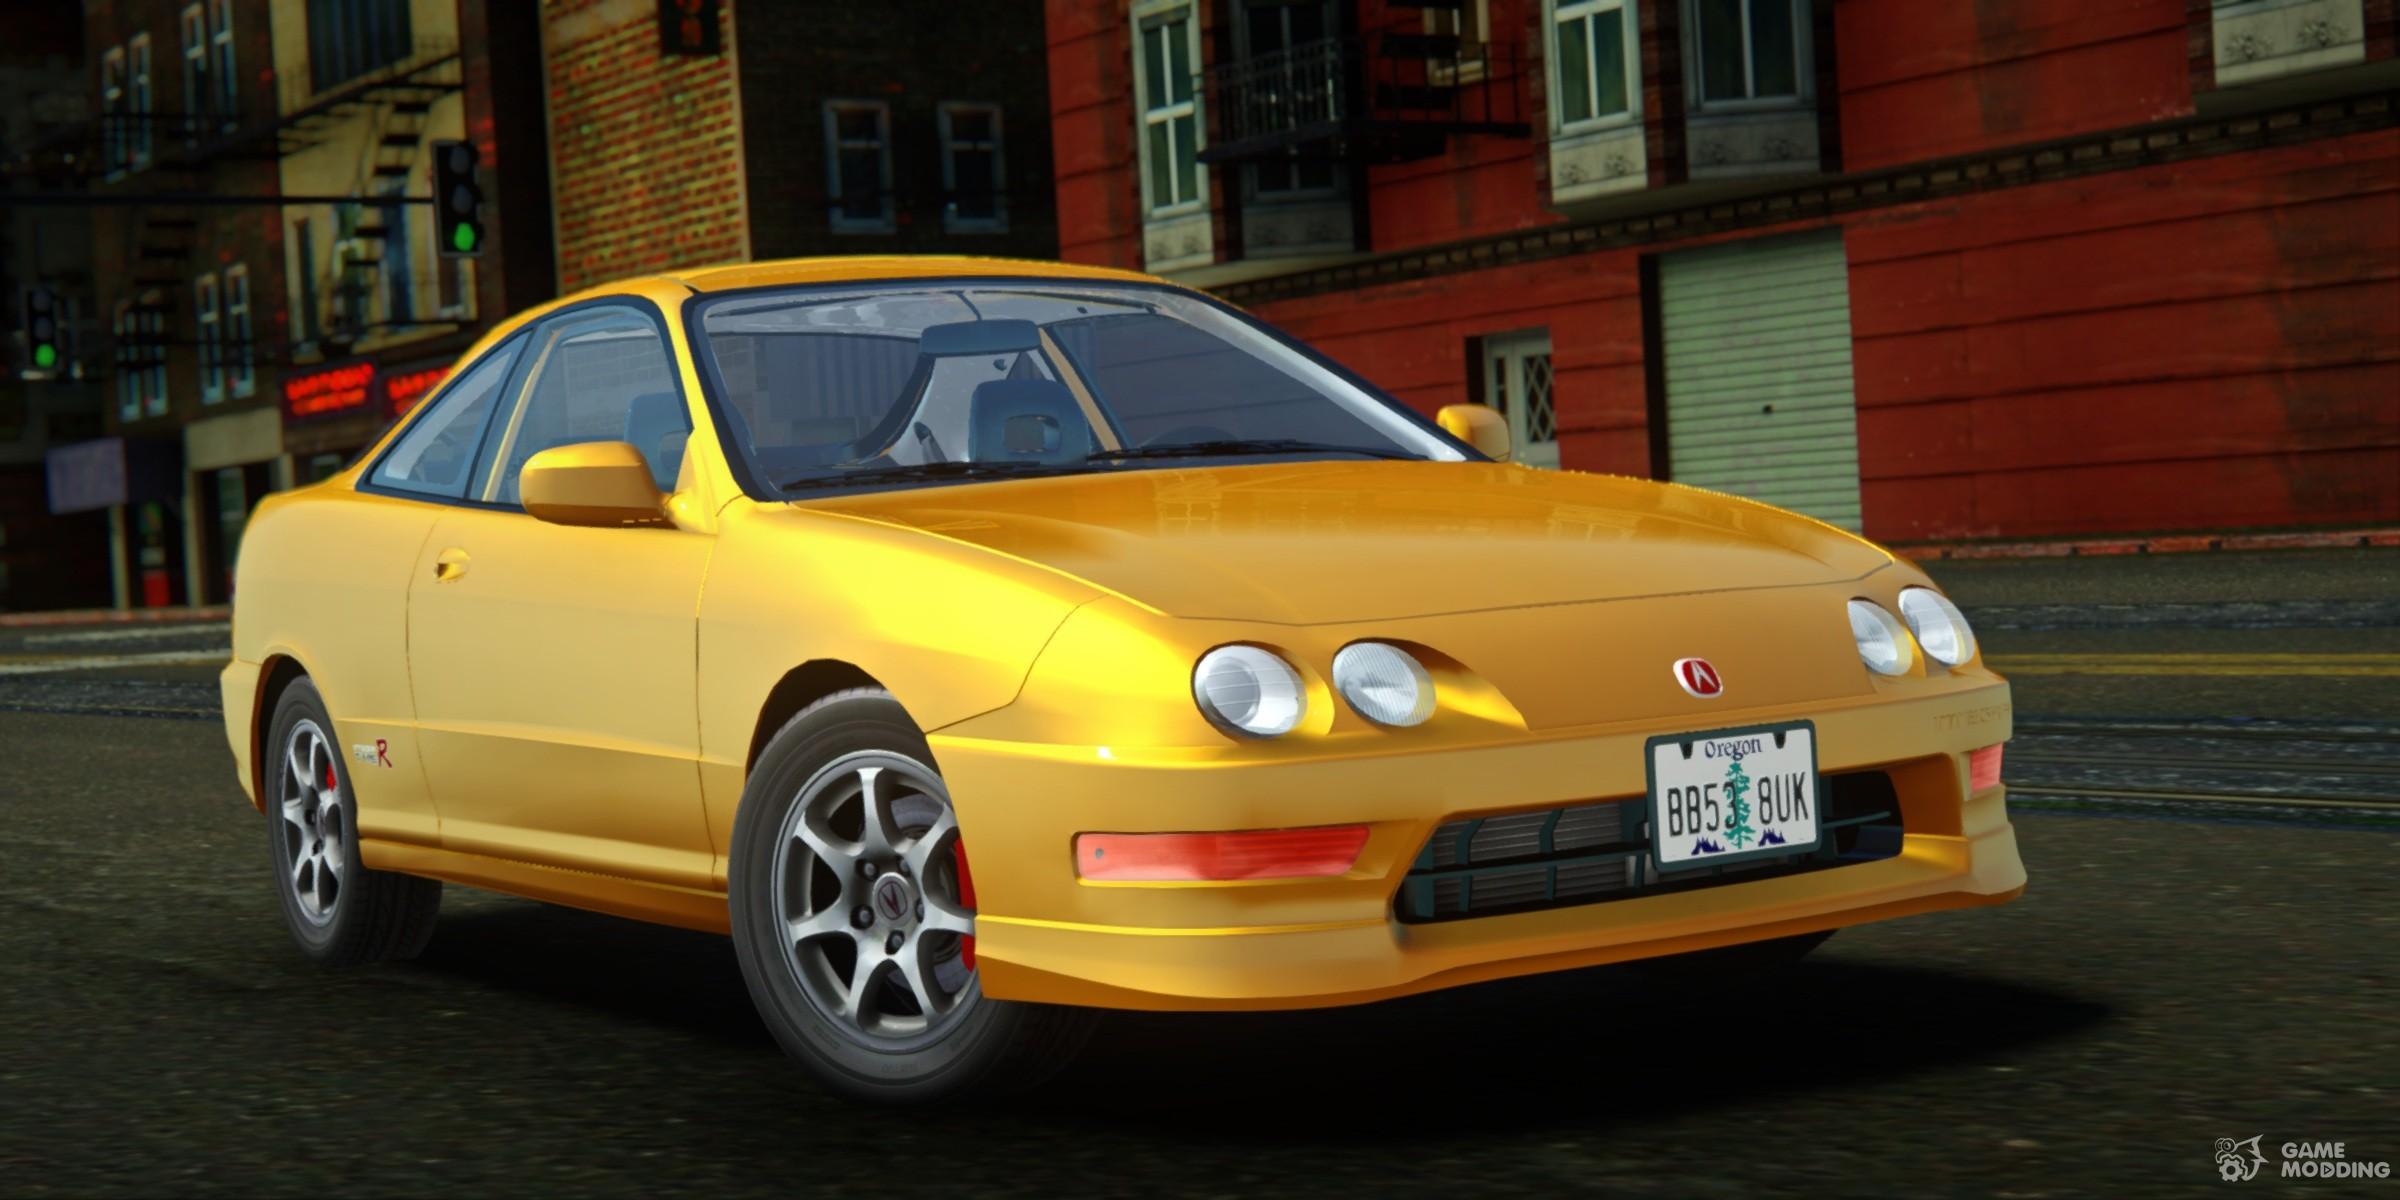 2001 Acura Integra Type R Dc2 Usdm For Gta San Andreas